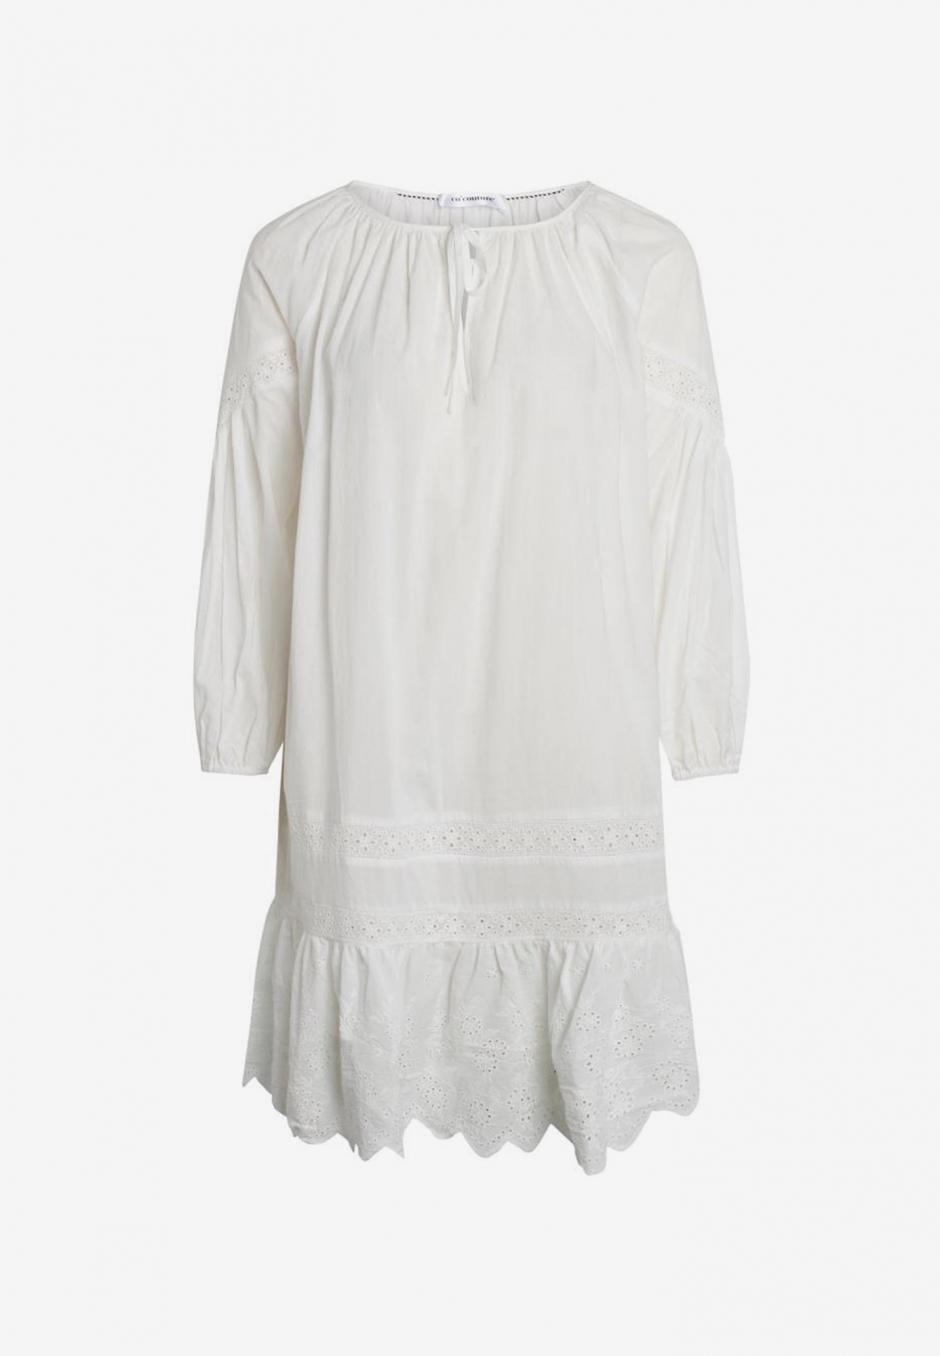 Co'couture Mara Anglaise Dress